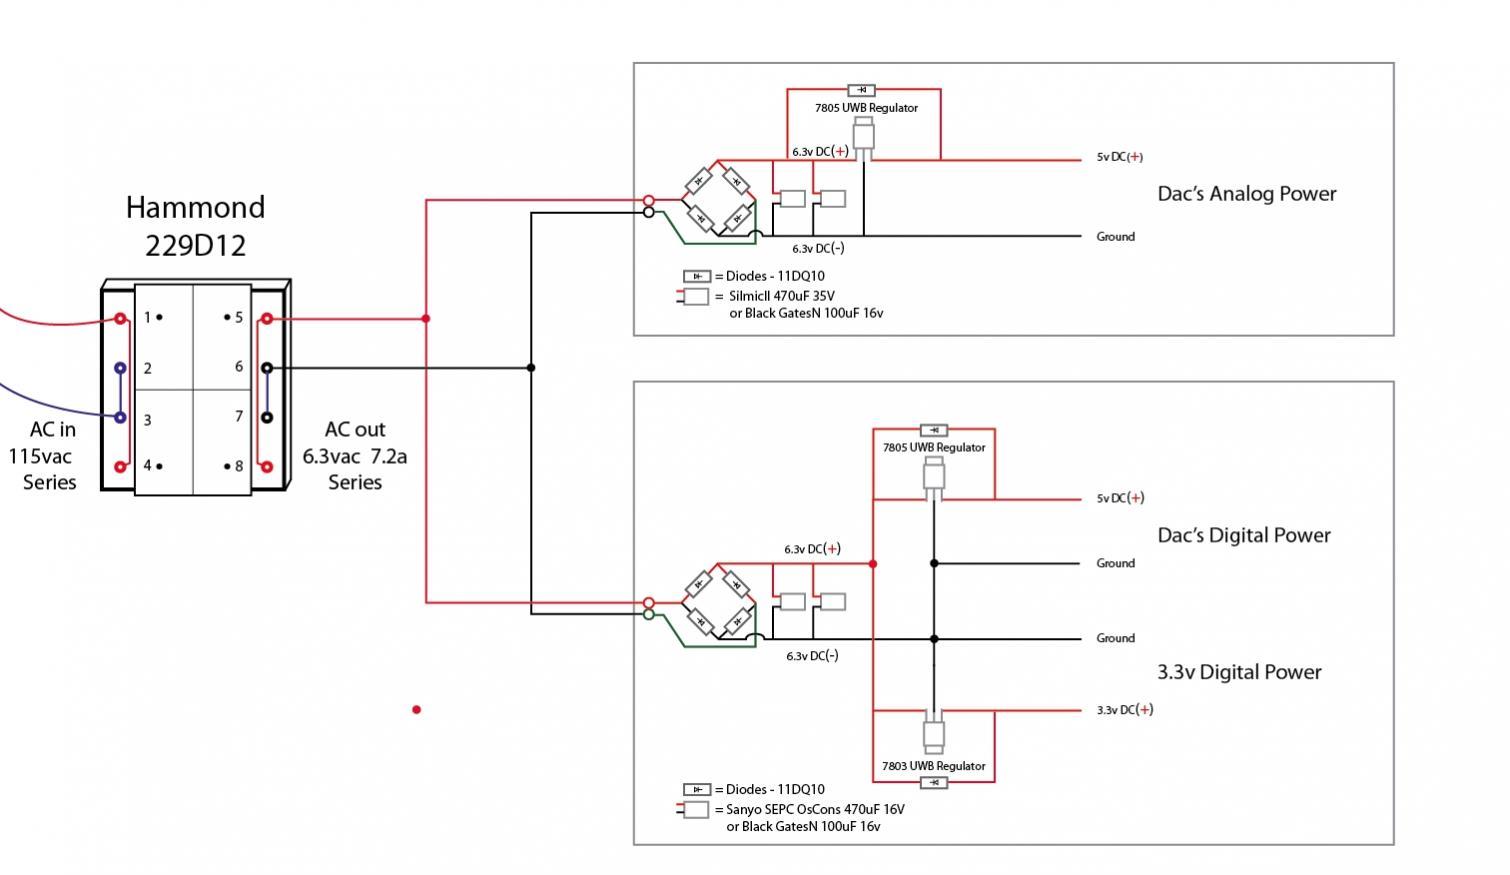 32810?resize\\\\\\\=665%2C385\\\\\\\&ssl\\\\\\\=1 headphone wiring diagram & headphone jack mesmerizing wiring skullcandy wiring diagram at fashall.co